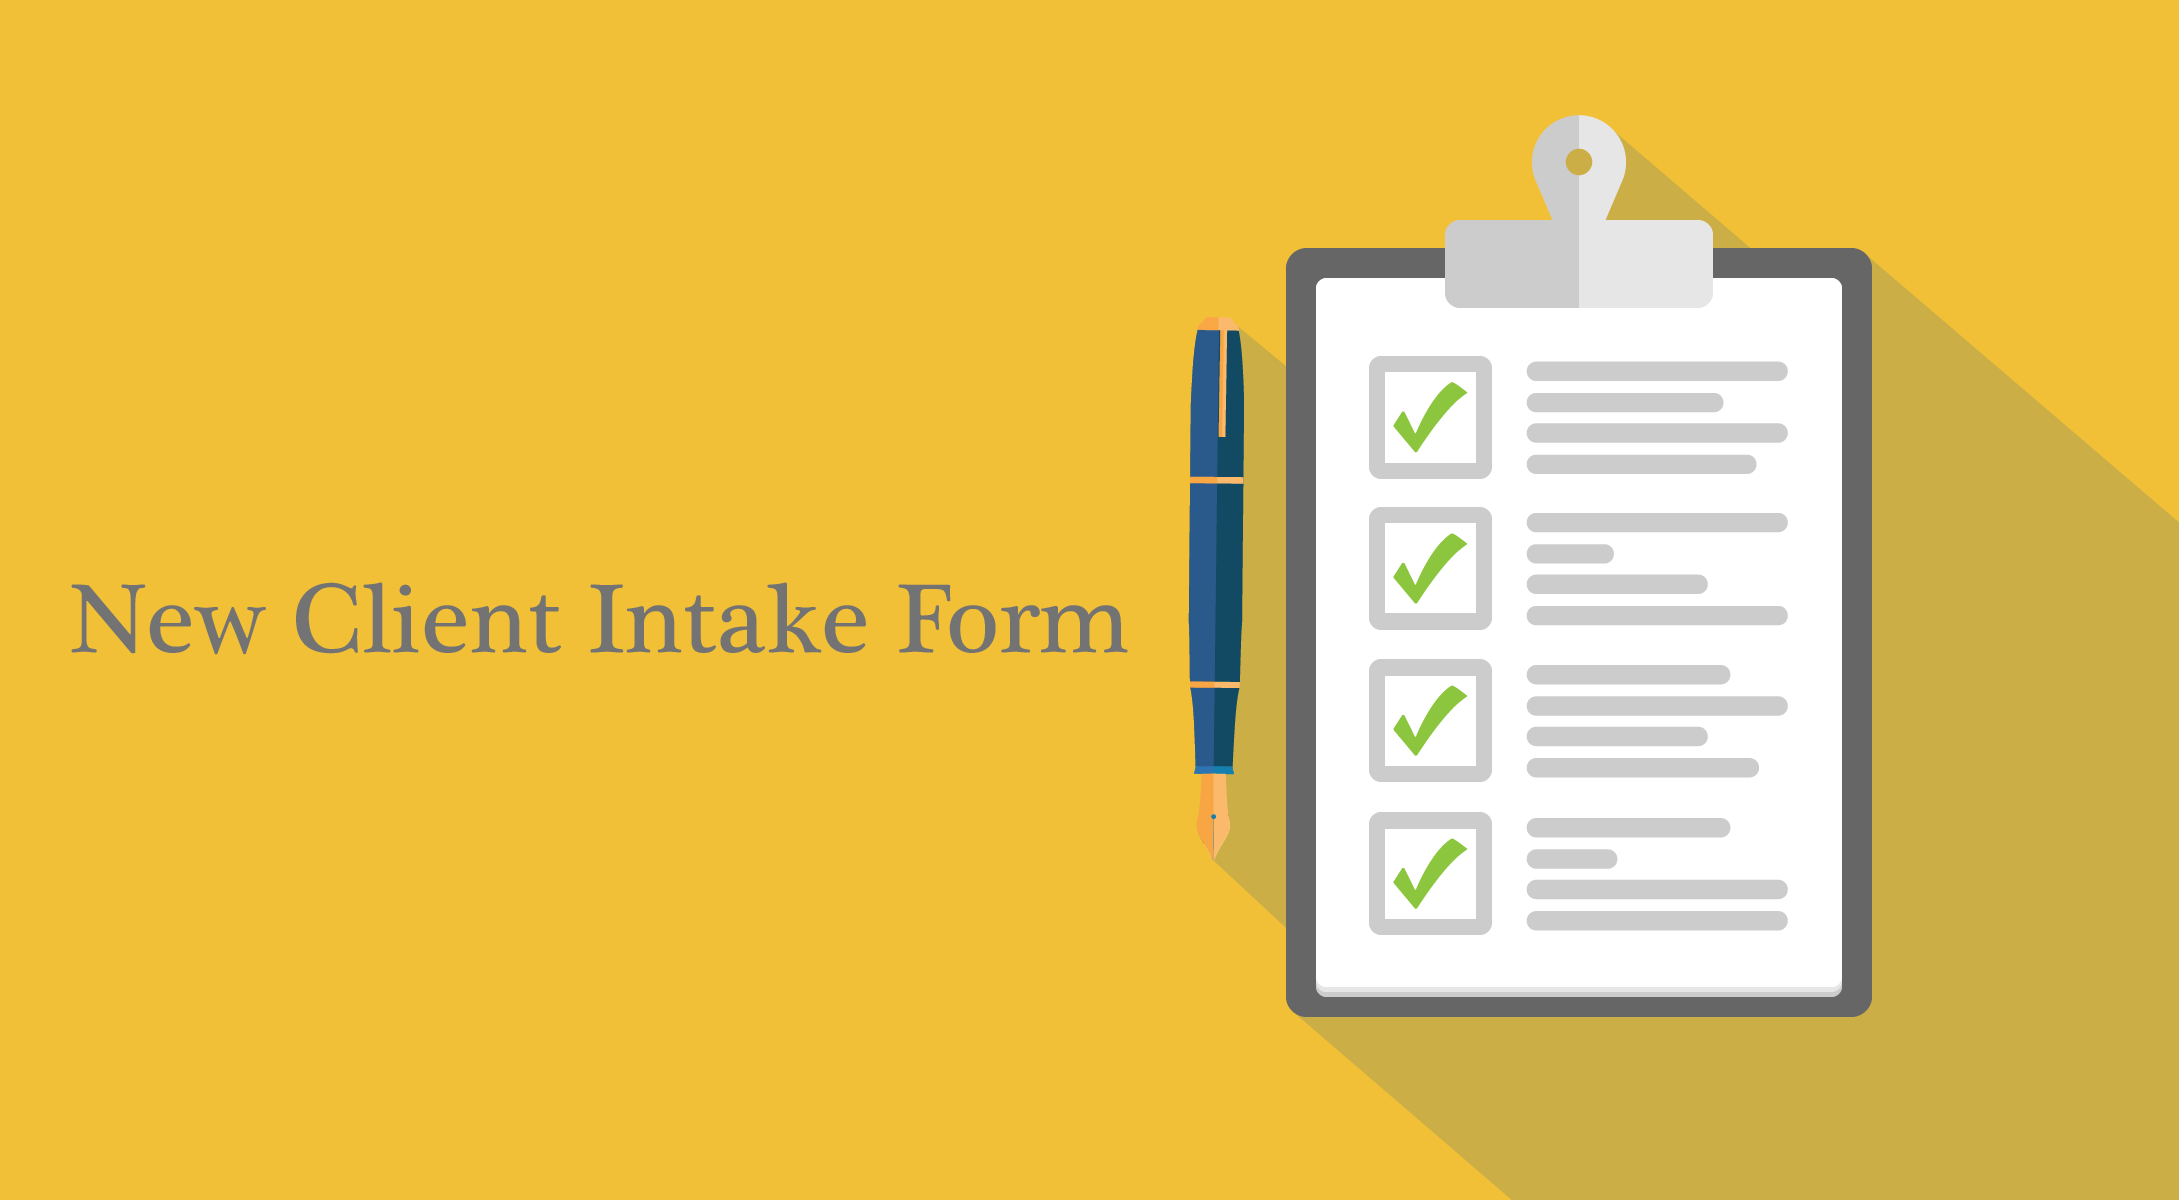 LIG- Intake Form Pic